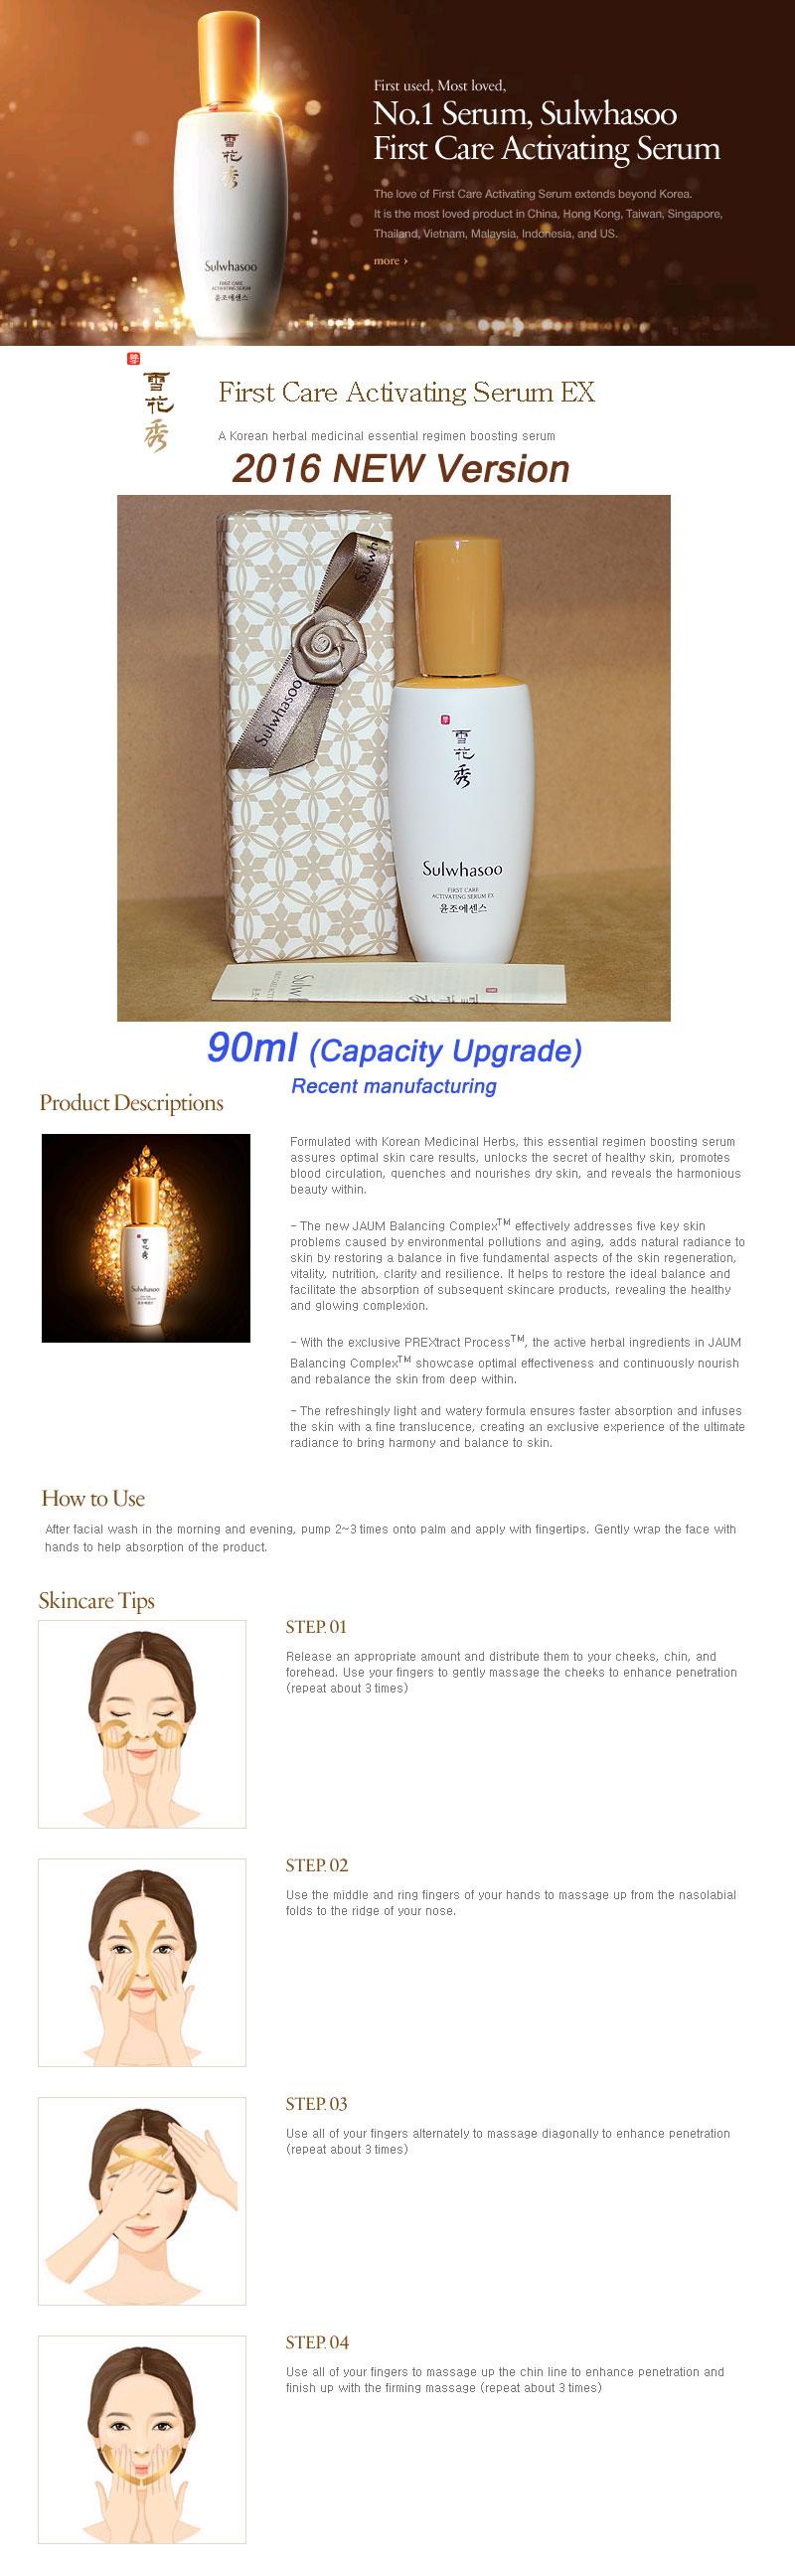 brand-new-sulwhasoo-first-care-activating-serum-essence-ex-90ml-dec